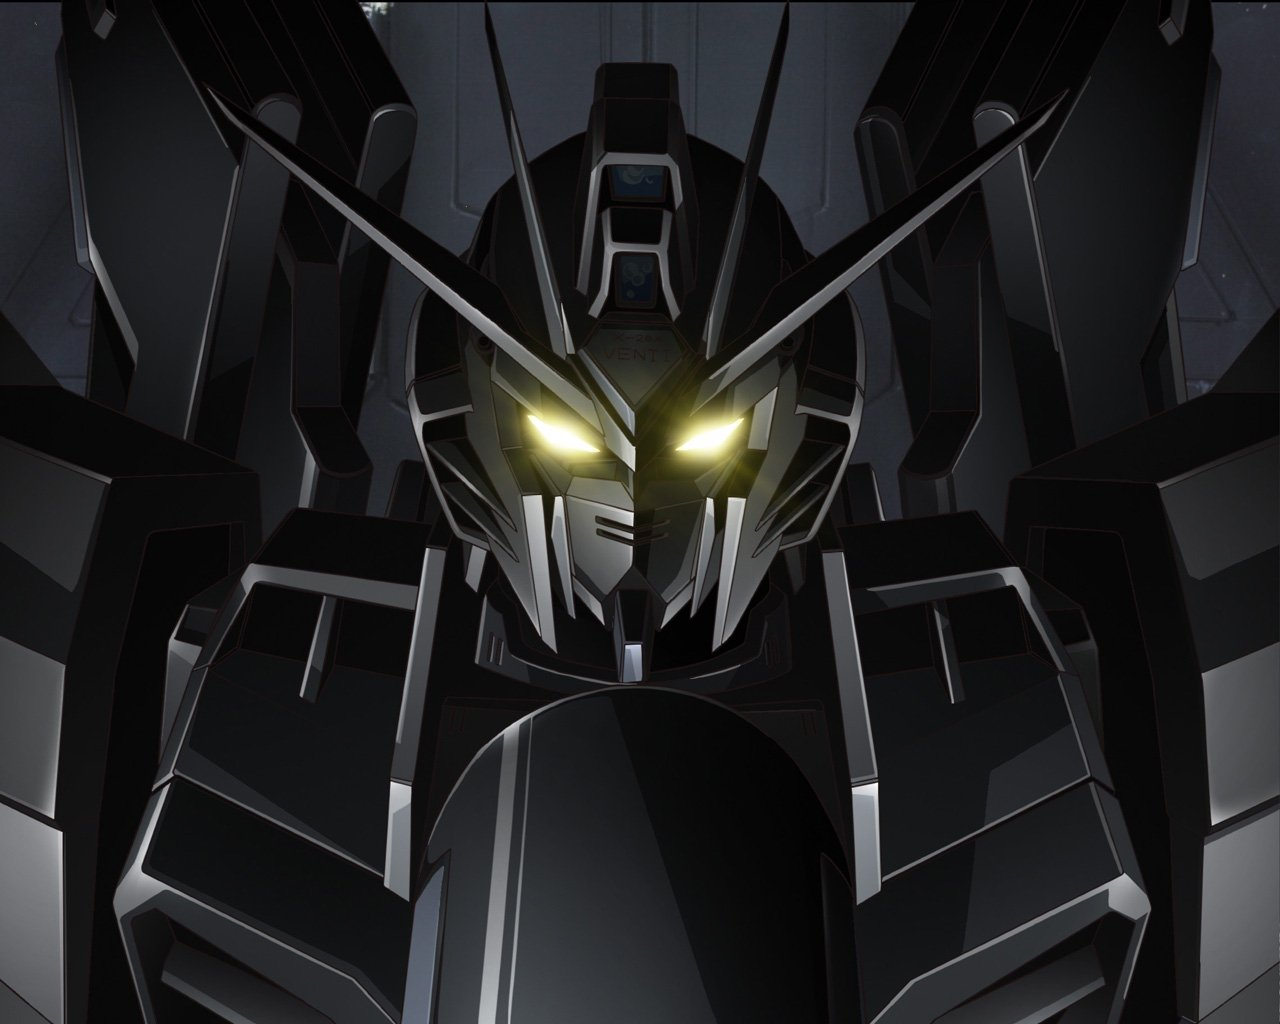 WIP Strike Freedom Gundam VerF 1100 MG Part 0 1280x1024